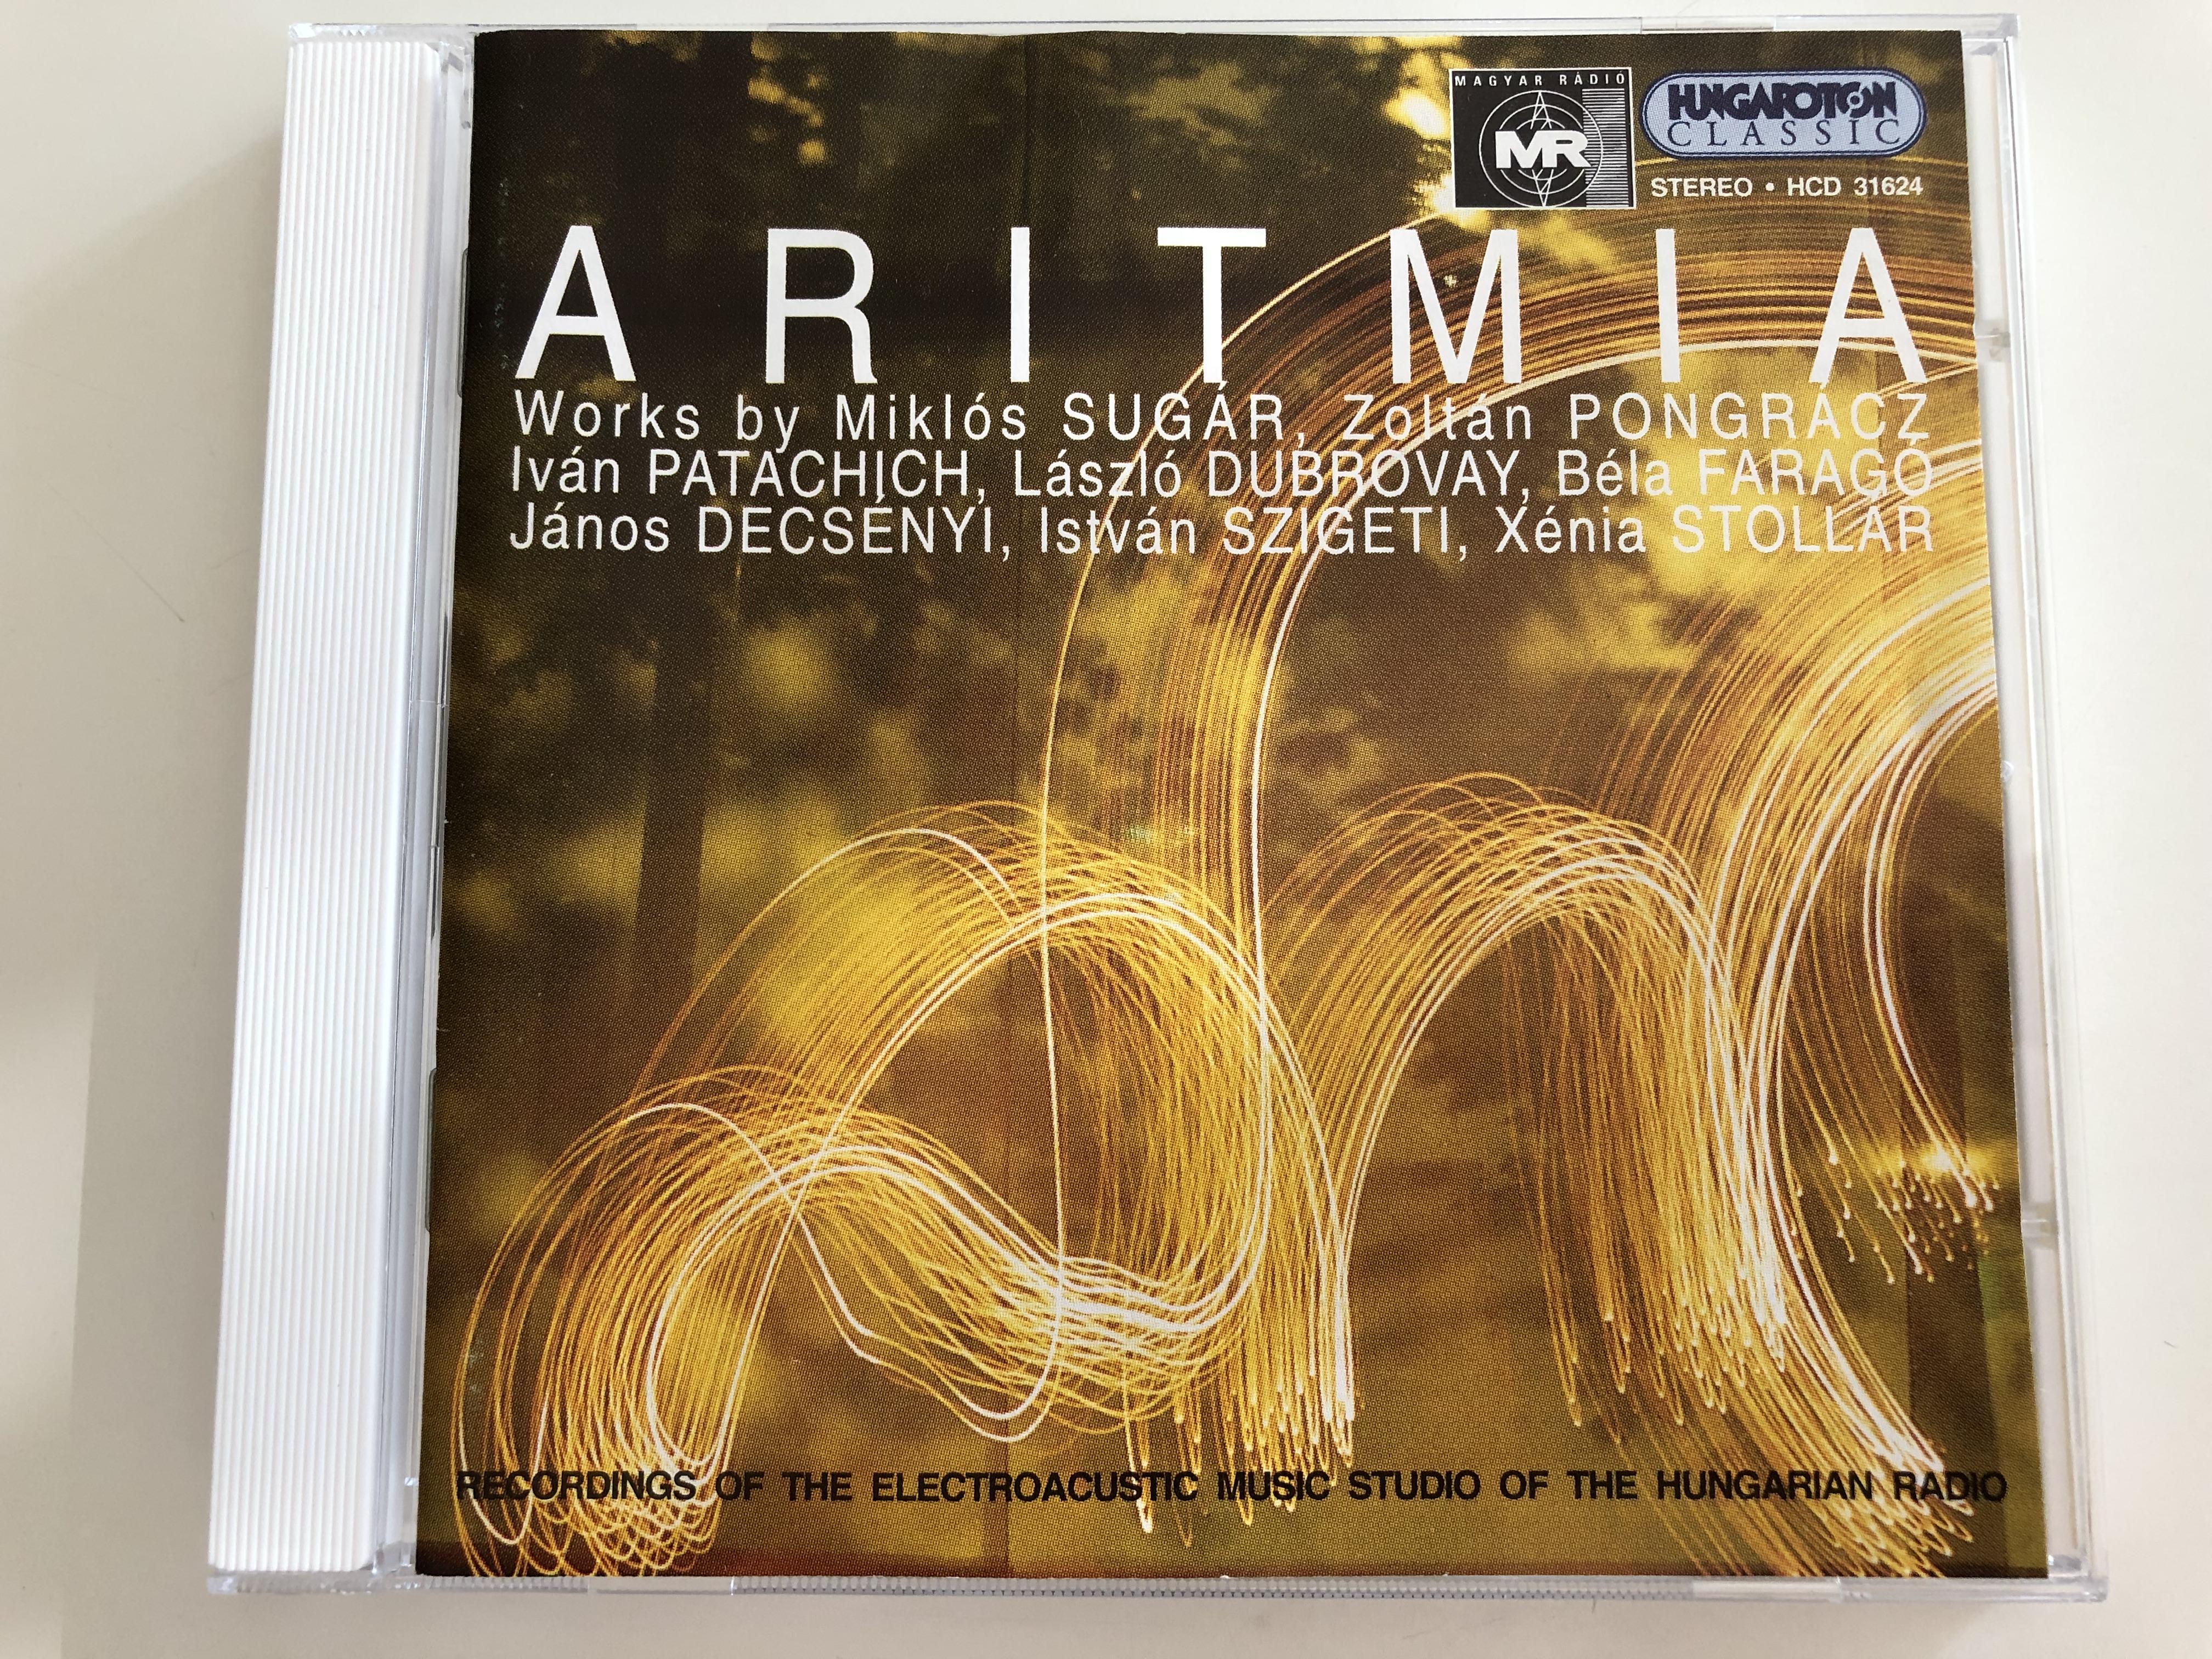 aritmia-works-by-mikl-s-sug-r-zolt-n-pongr-cz-iv-n-patachich-l-szl-dubrovay-b-la-farag-j-nos-decs-nyi-istv-n-szigeti-x-nia-stoll-r-hungaroton-classic-magyar-r-di-audio-cd-1995-hcd-31624-1-.jpg